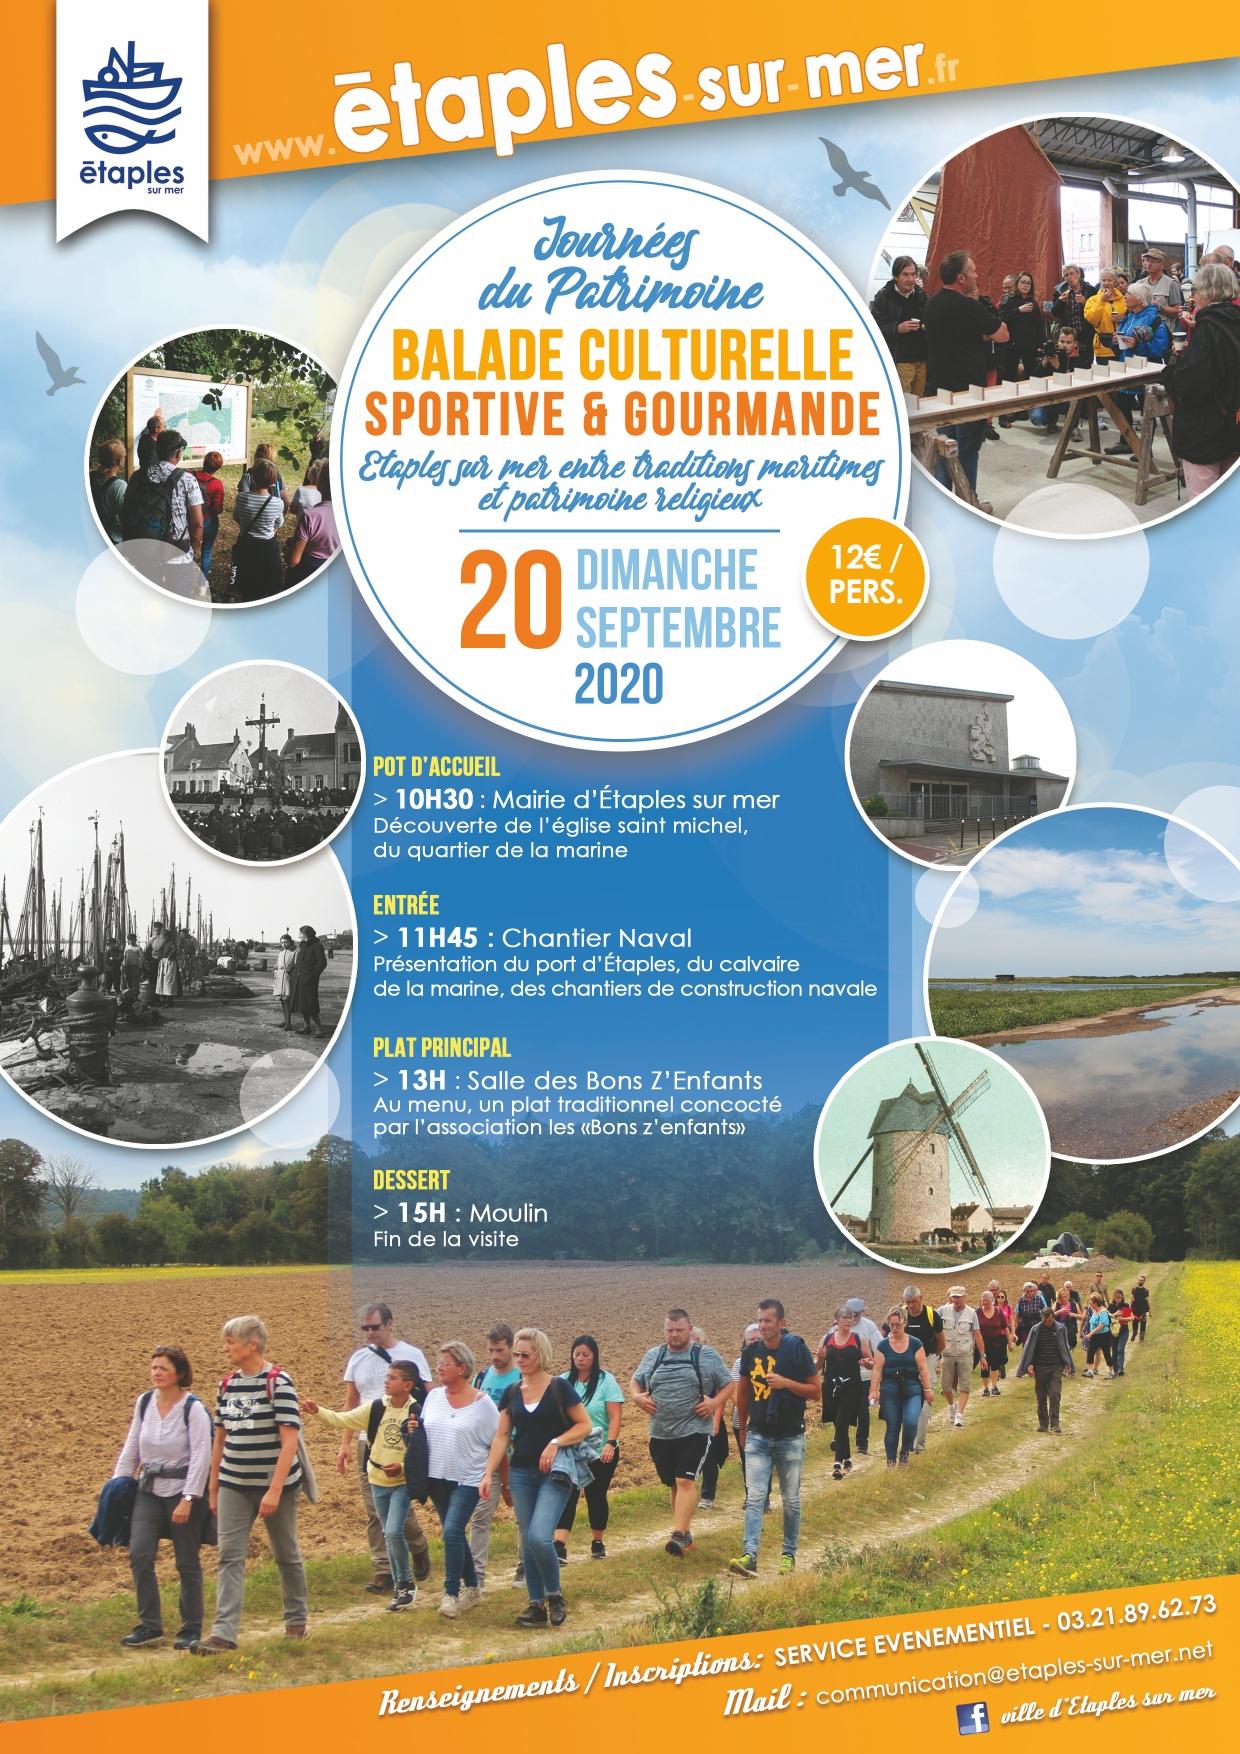 JOURNÉES EUROPÉENNES DU PATRIMOINE : BALADE CULTURELLE, SPORTIVE & GOURMANDE